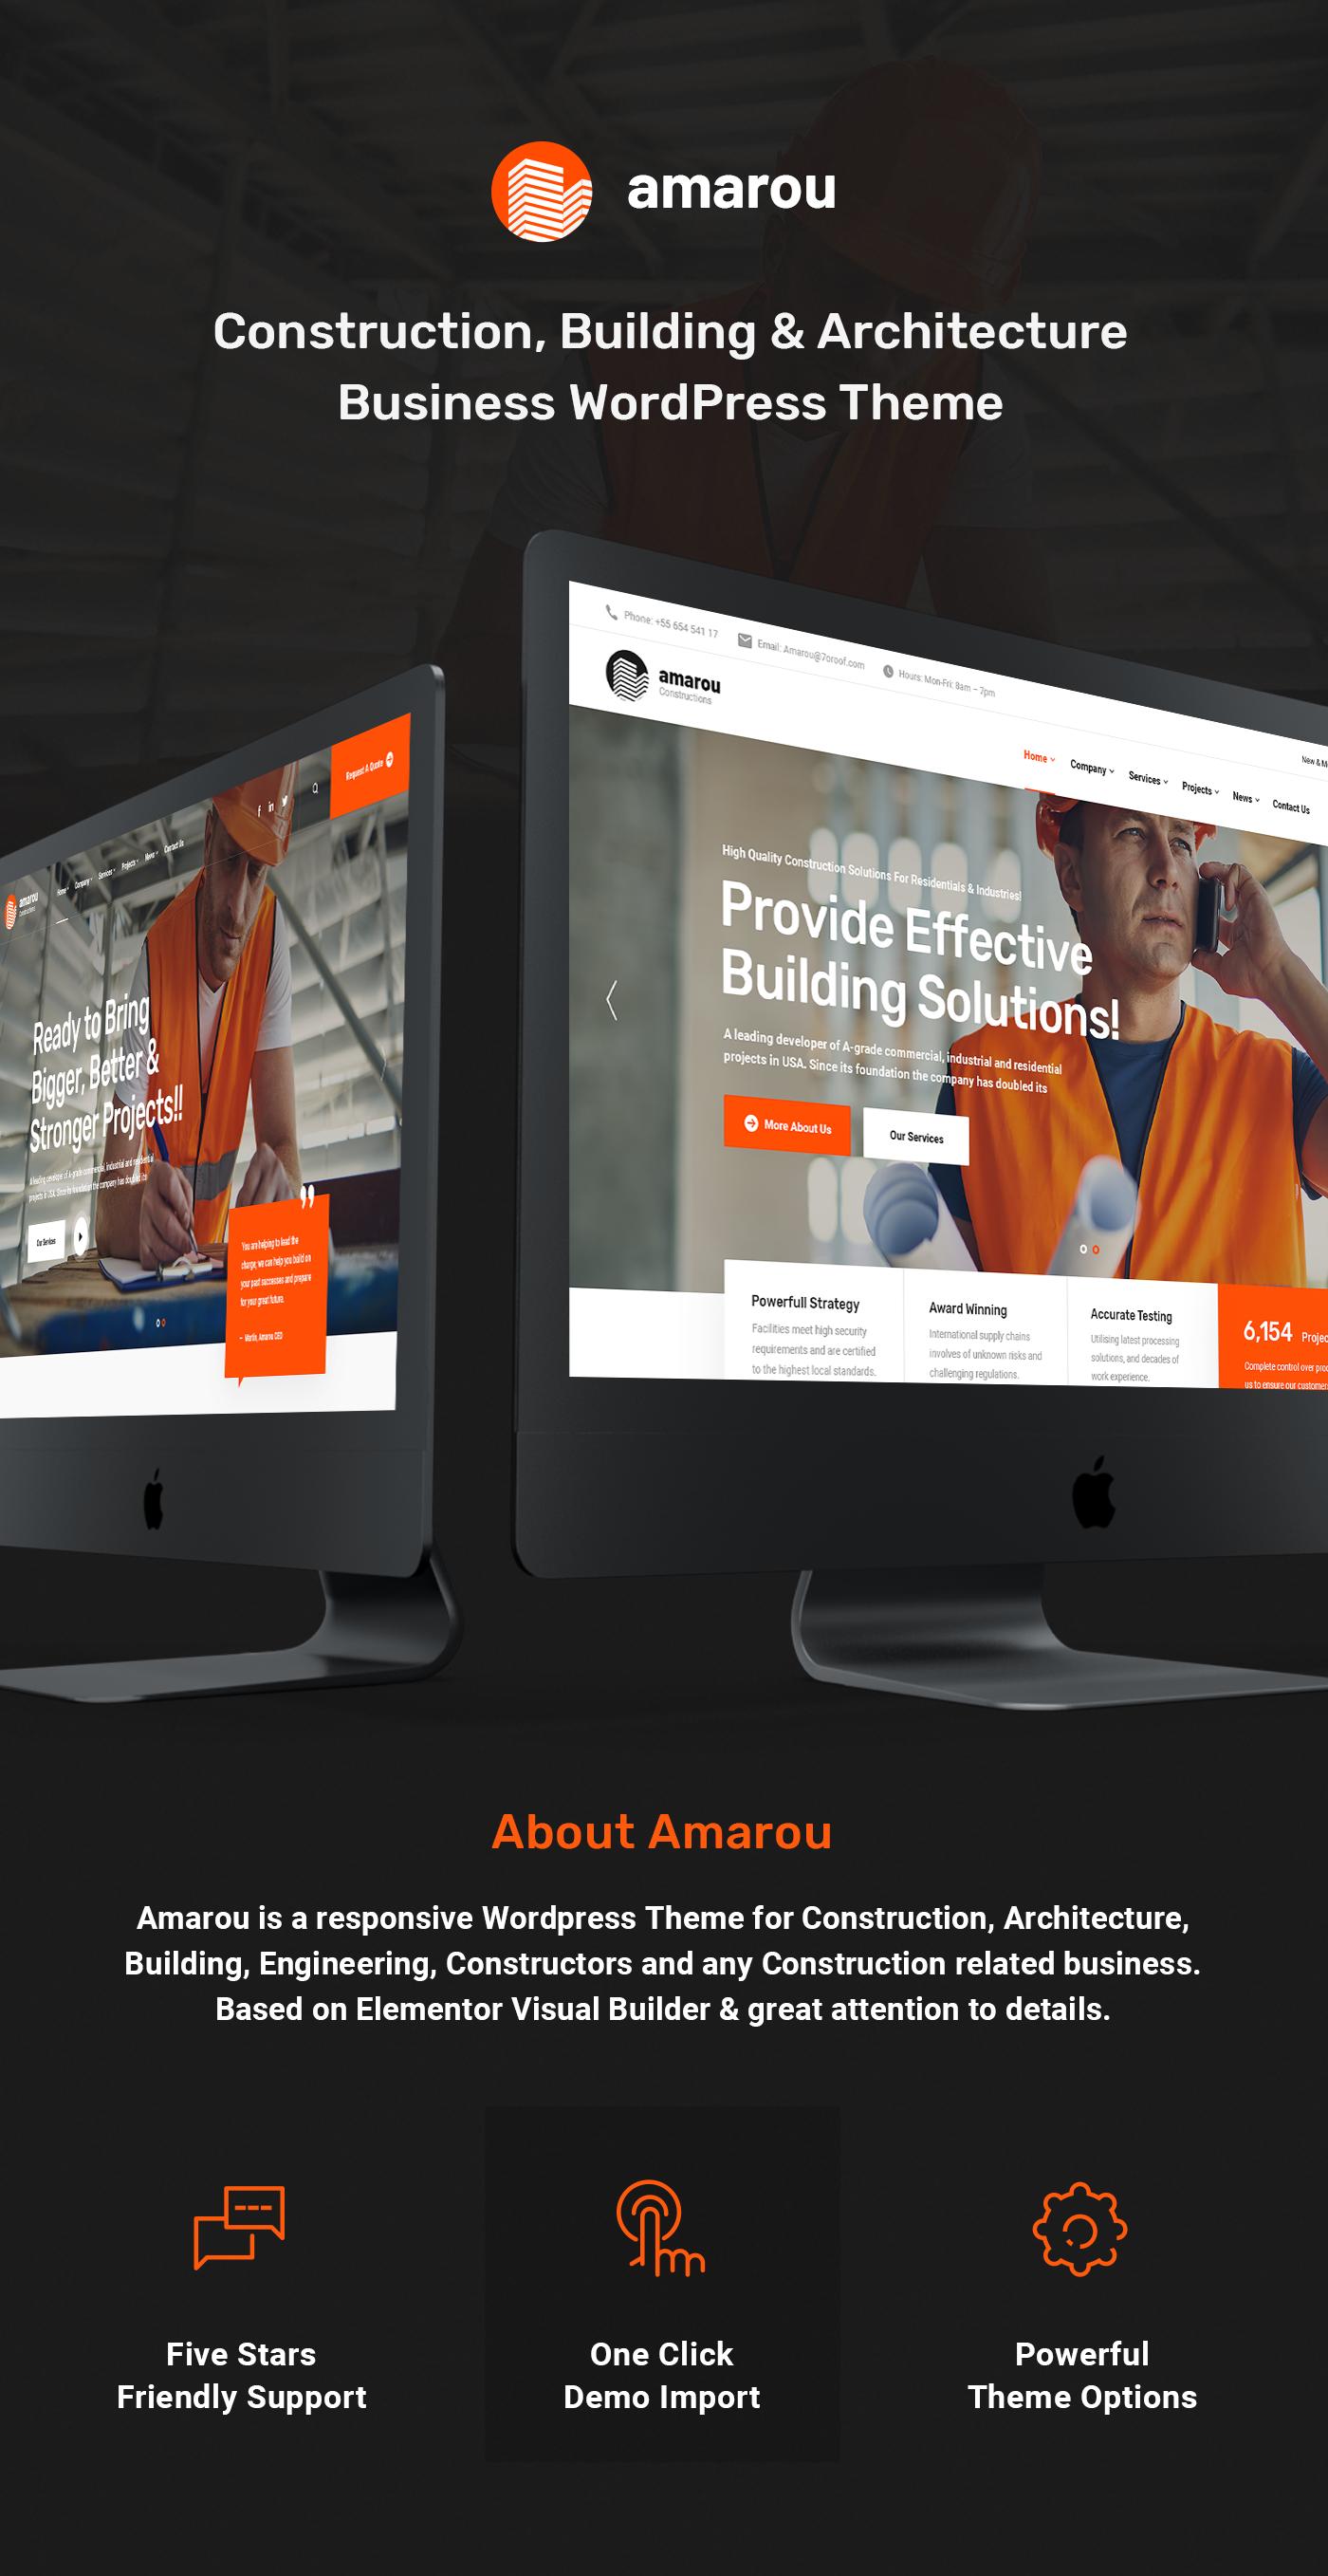 Amarou - Construction, Building & Architecture Business WordPress Theme - 1